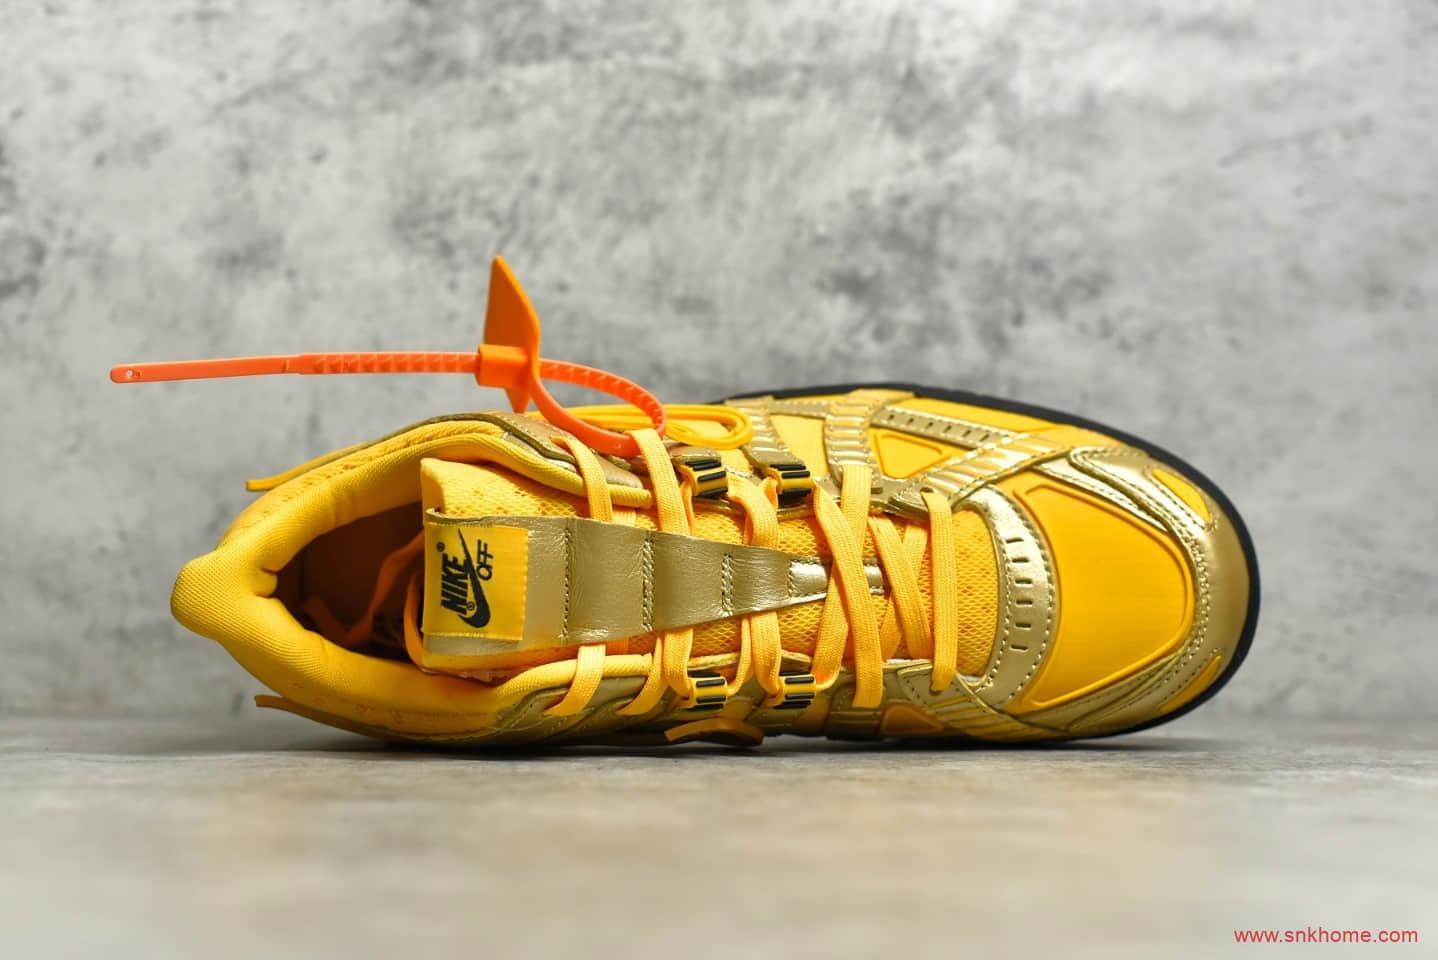 耐克Dunk SB OW联名黄色低帮板鞋 OFF-White x NIKE Air Rubber Dunk